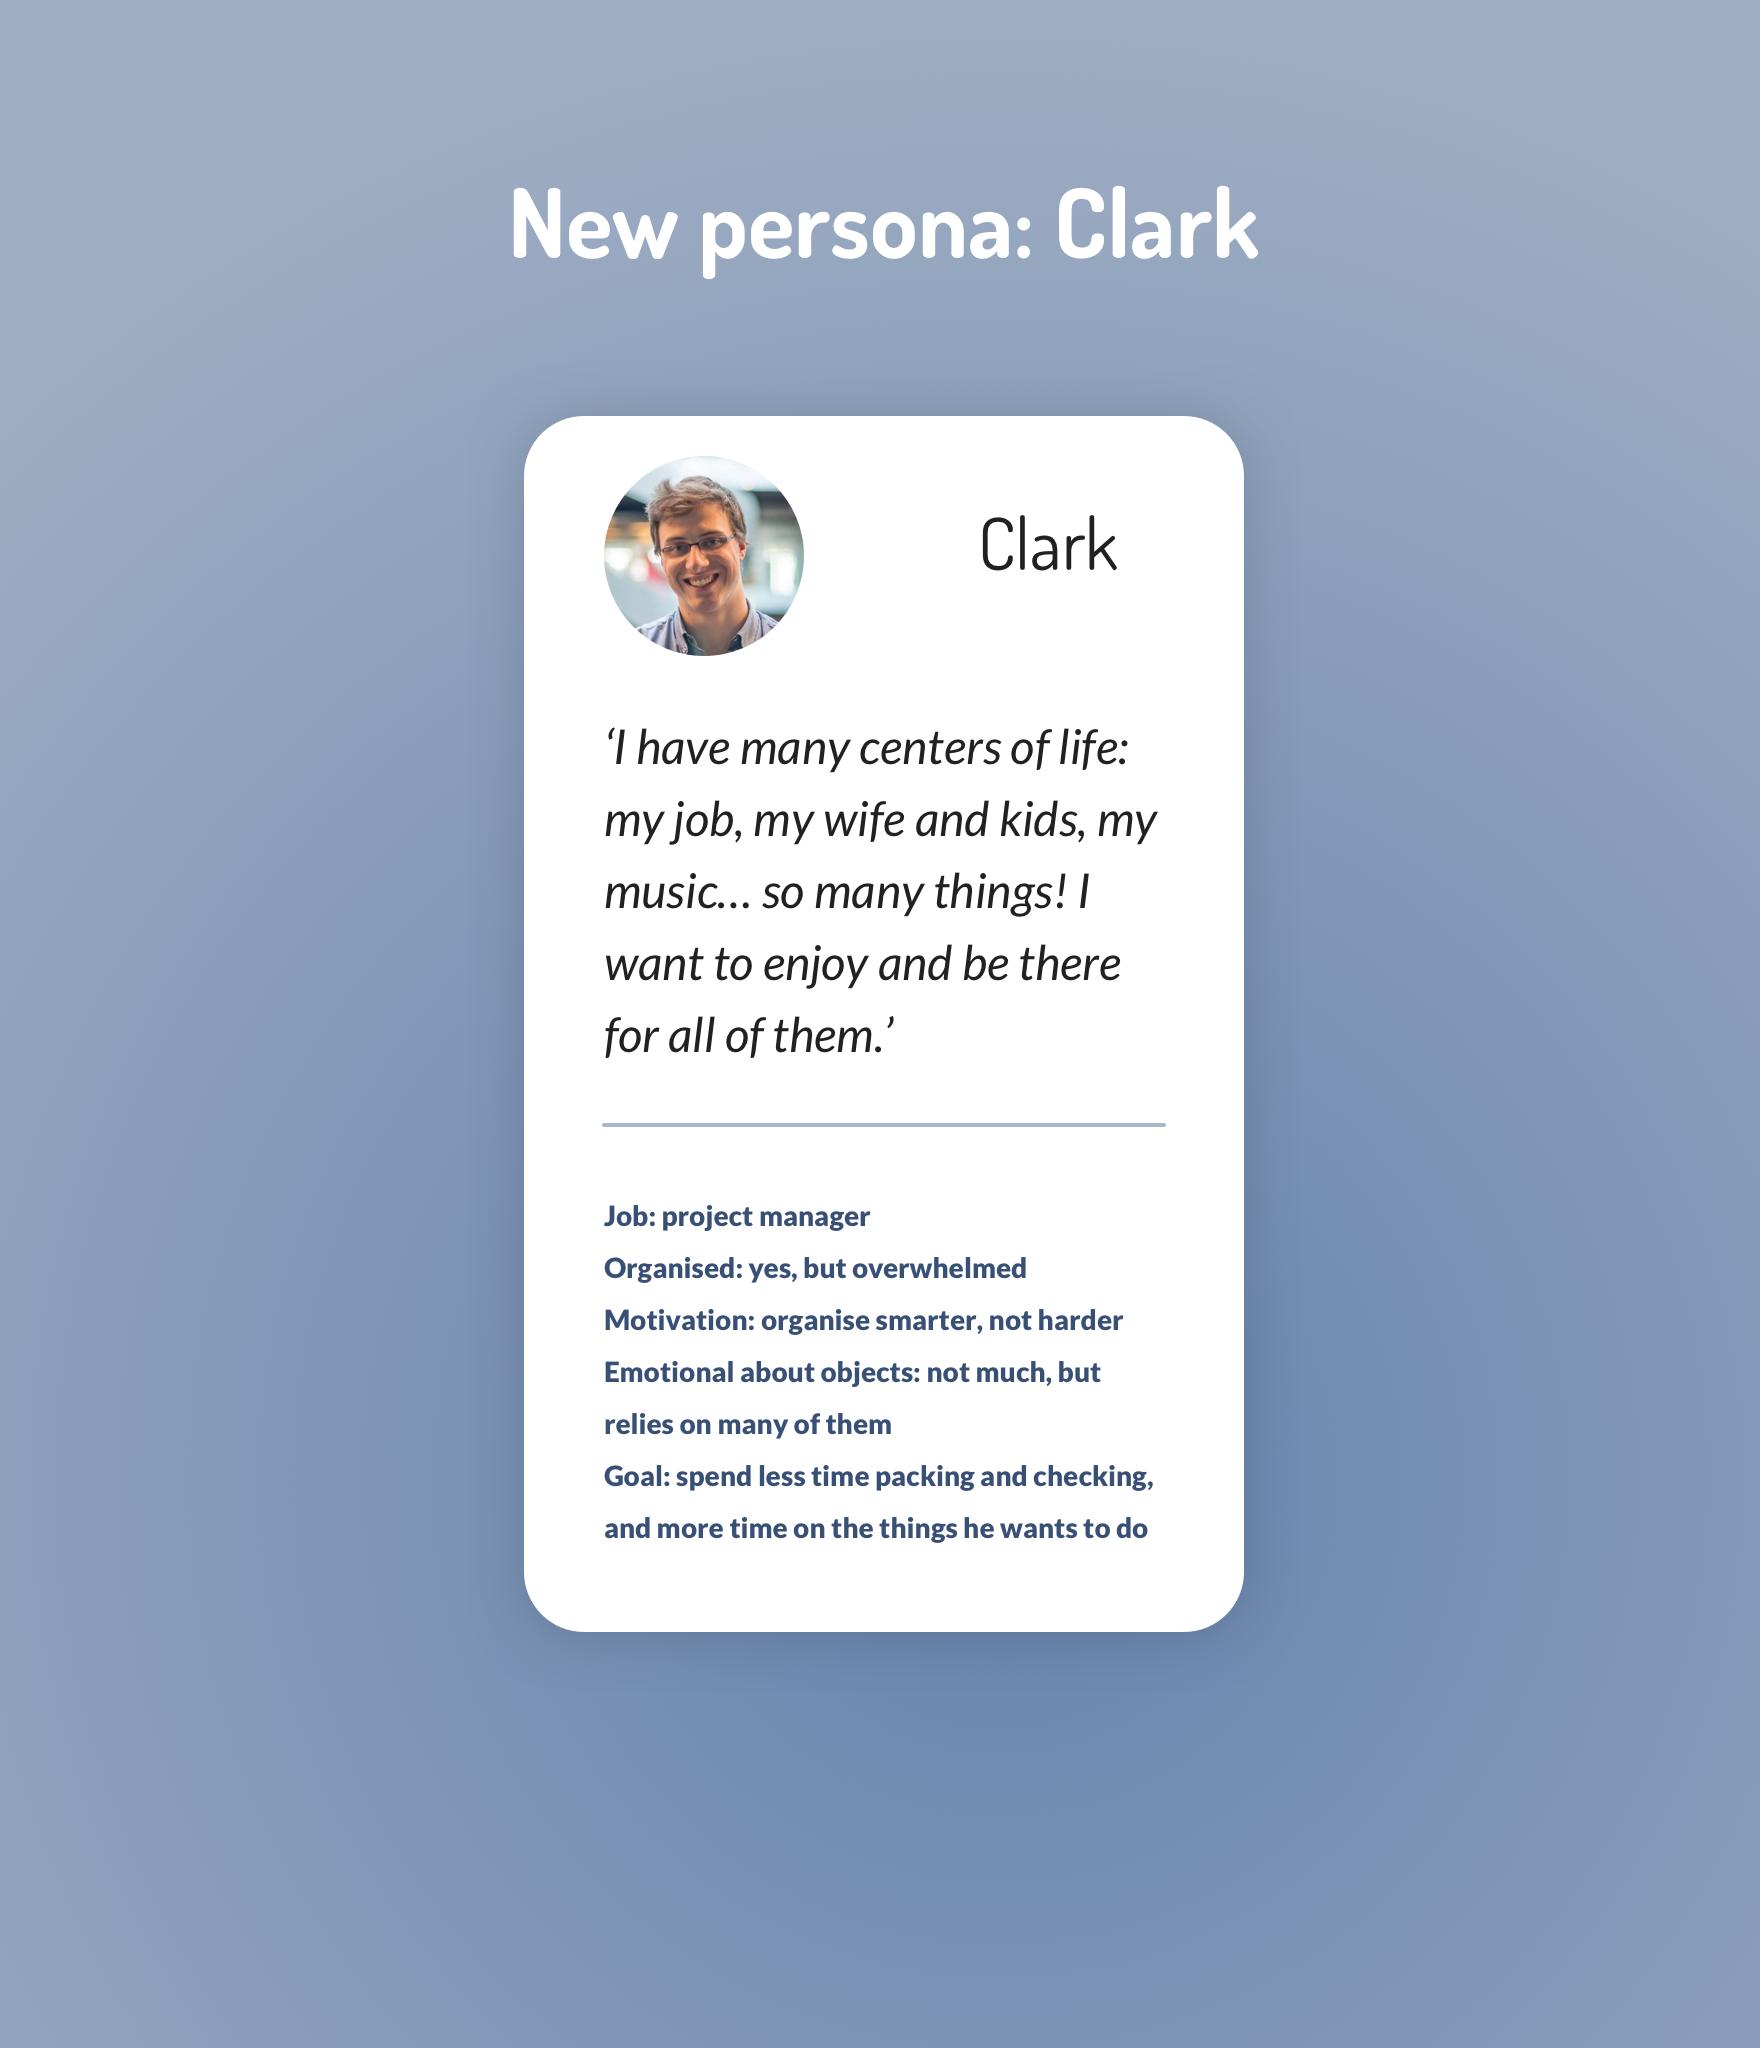 new persona Clark